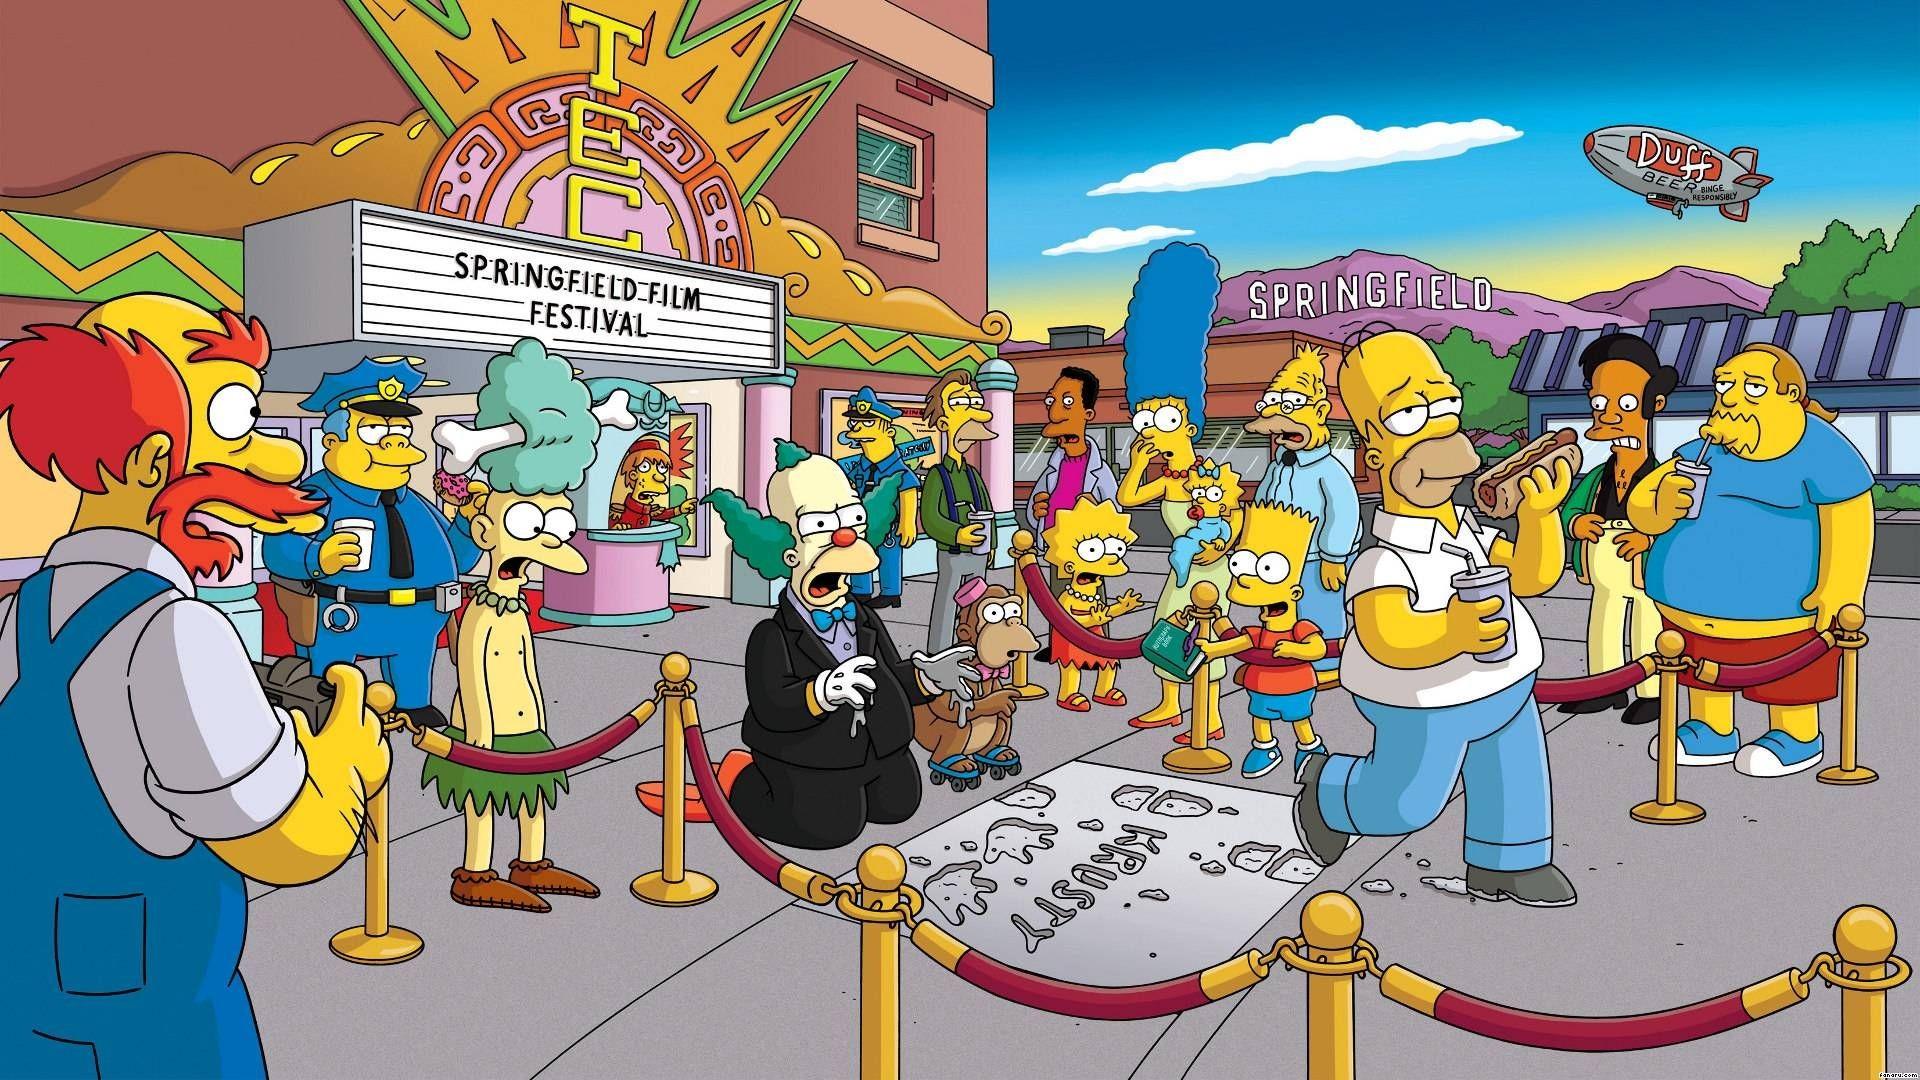 Homer Simpsons Stoned Hd Desktop Wallpaper Mobile   - Desktop Wallpaper The Simpsons - HD Wallpaper